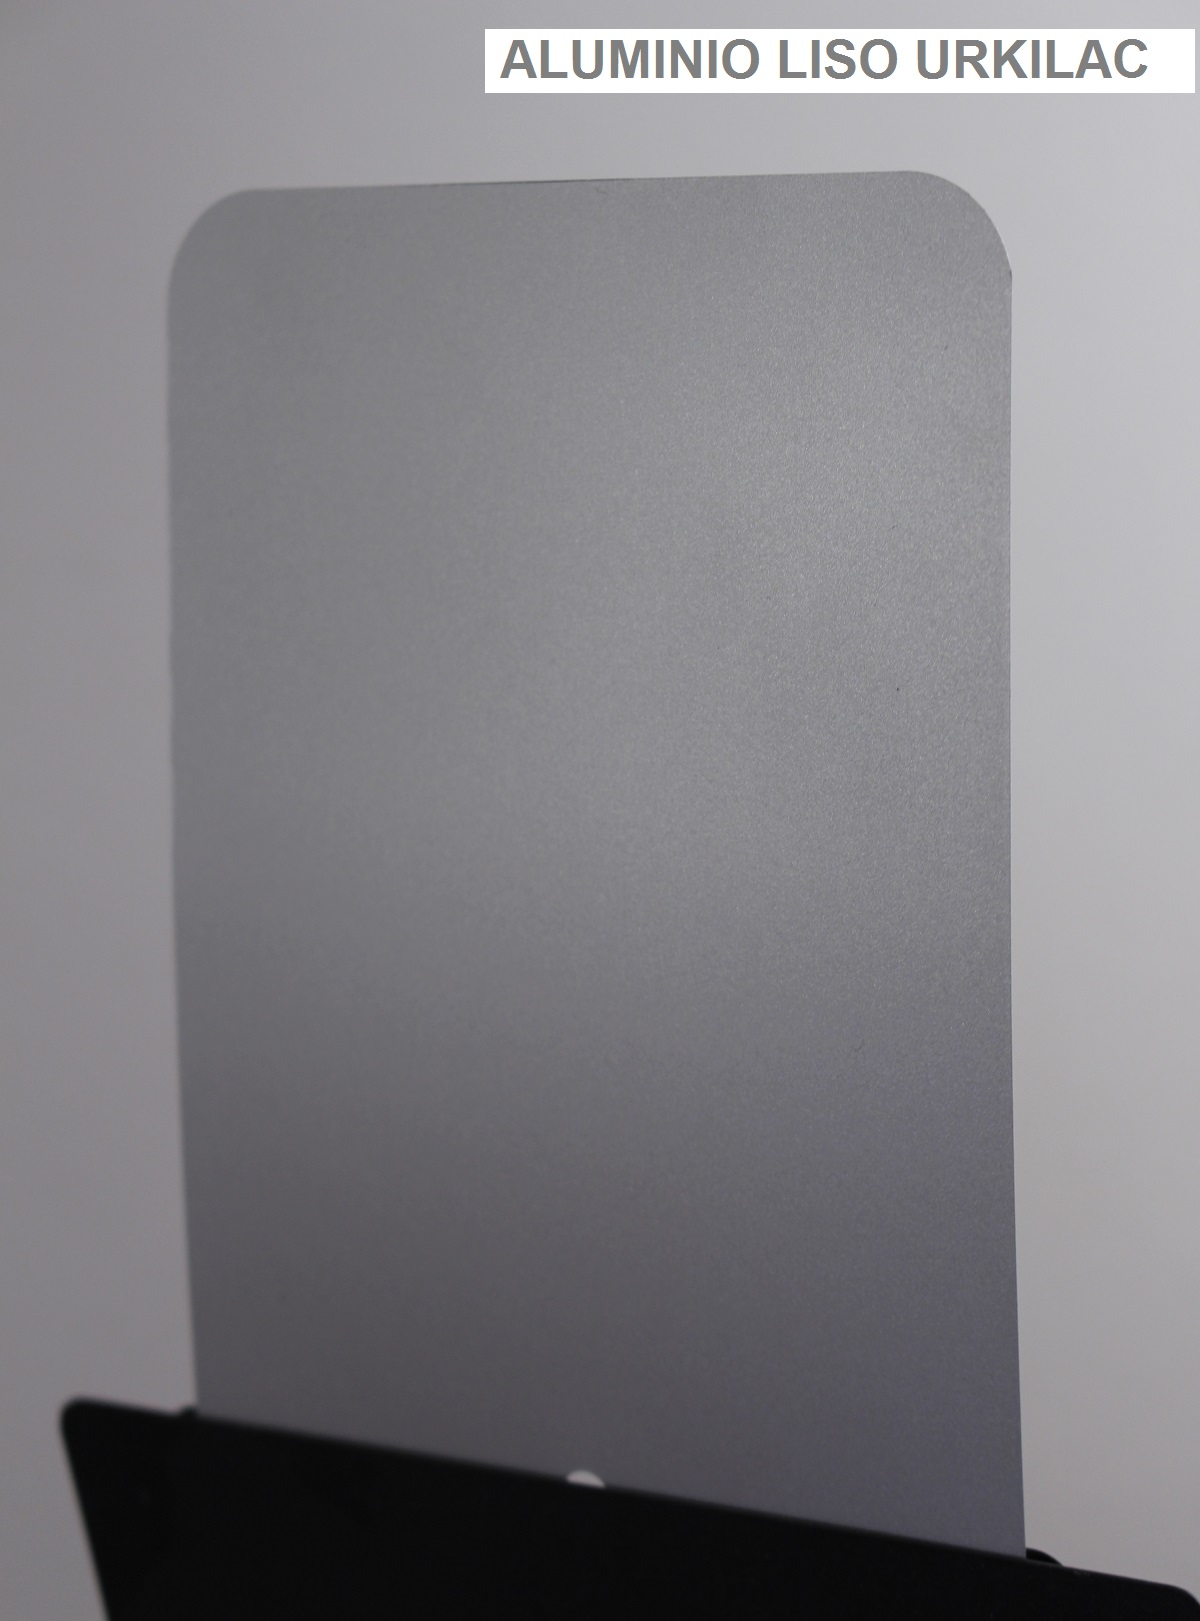 Pintura aluminio llantas Urkilac